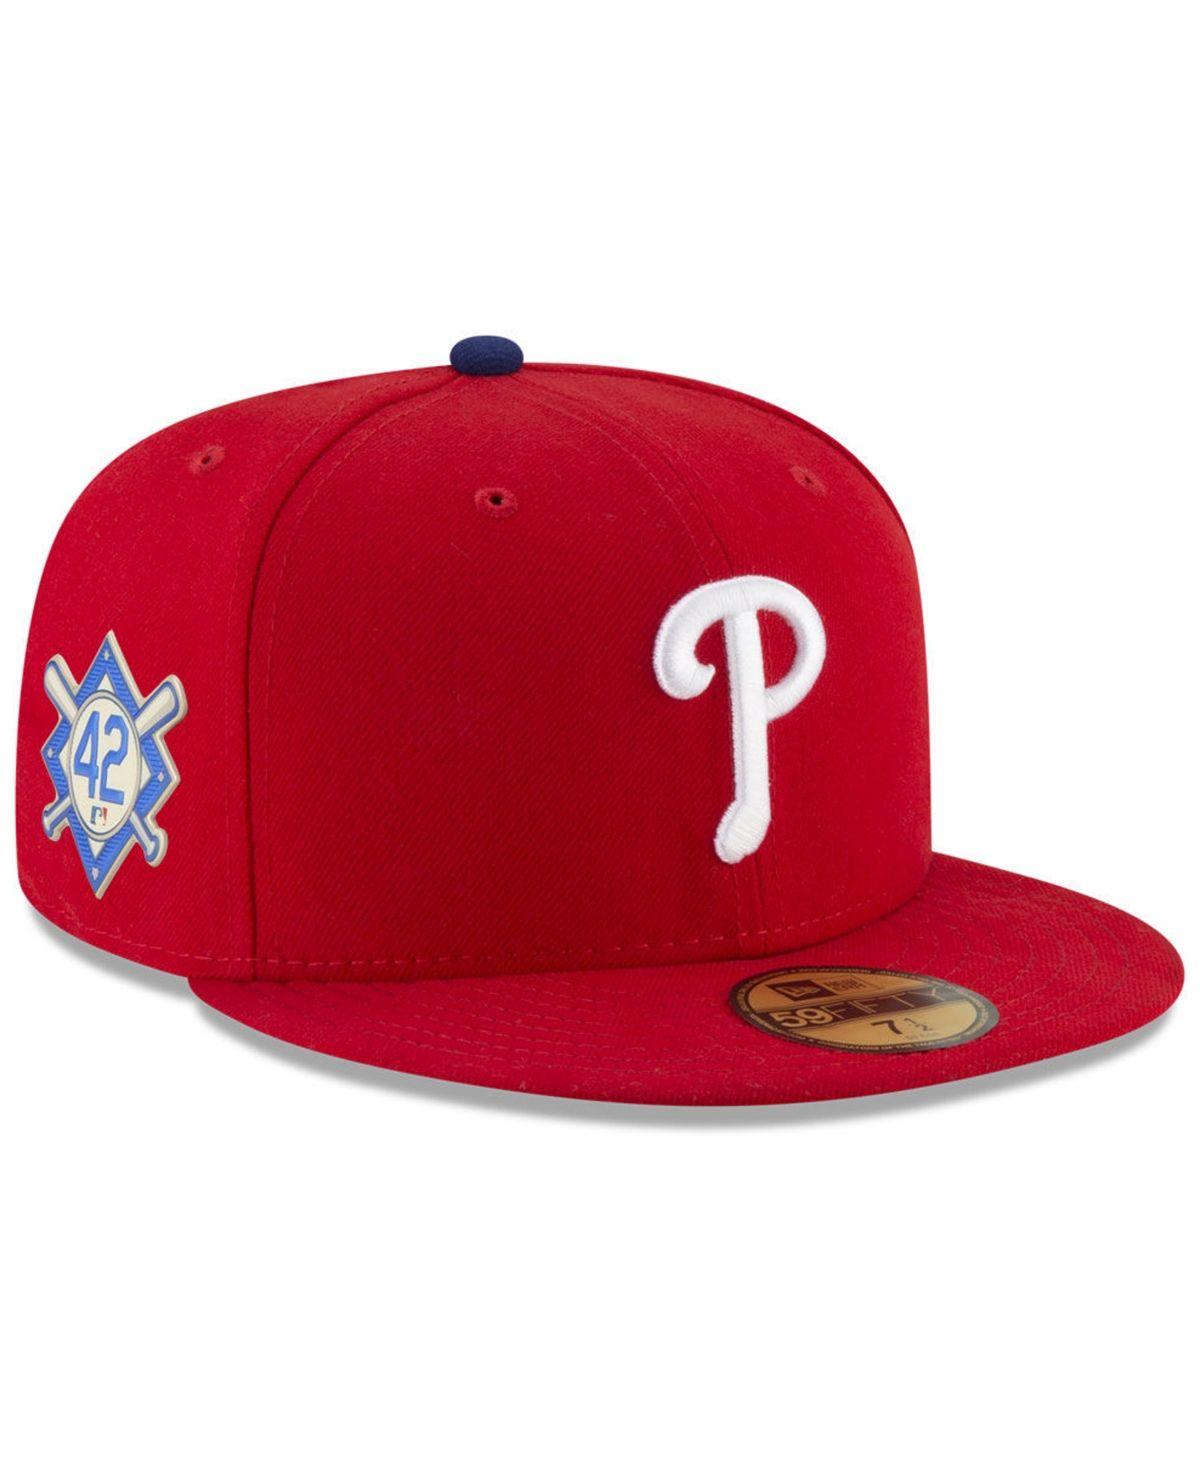 New Era Philadelphia Phillies Jackie Robinson Day 59fifty Fitted Cap Red Jackie Robinson Day Fitted Hats Philadelphia Phillies